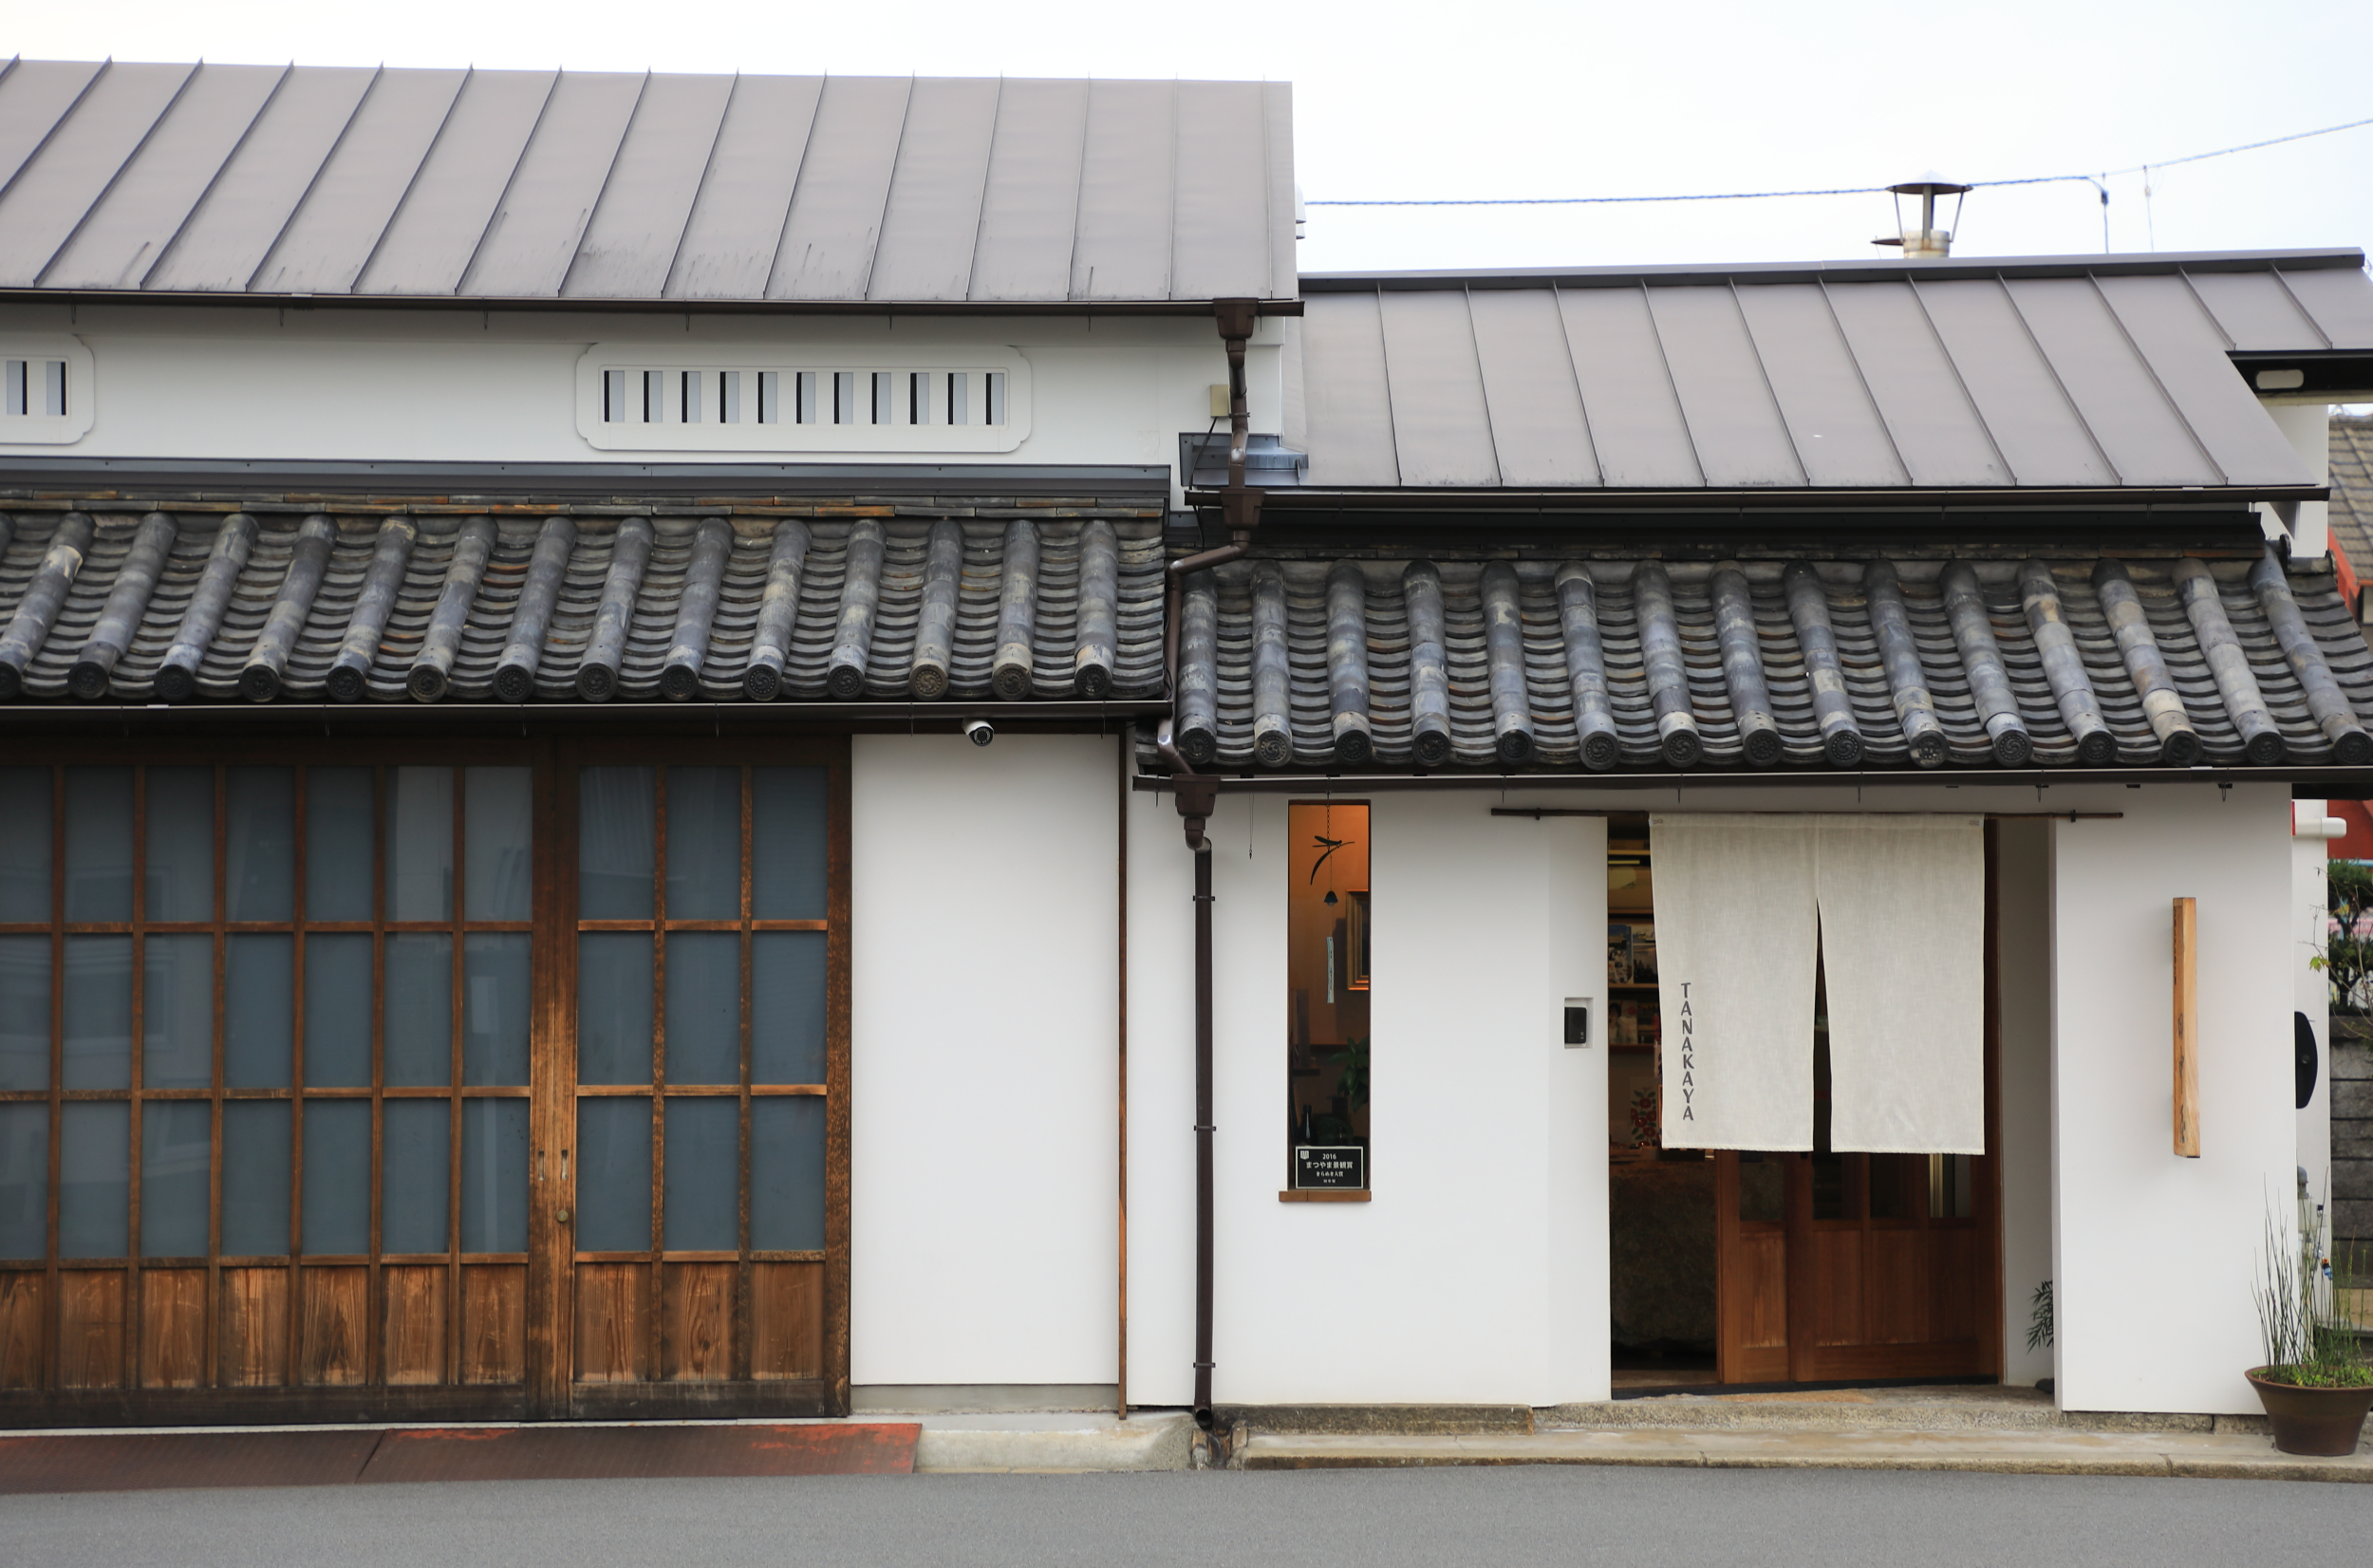 Entrance to Tanakaya soy sauce brewery.